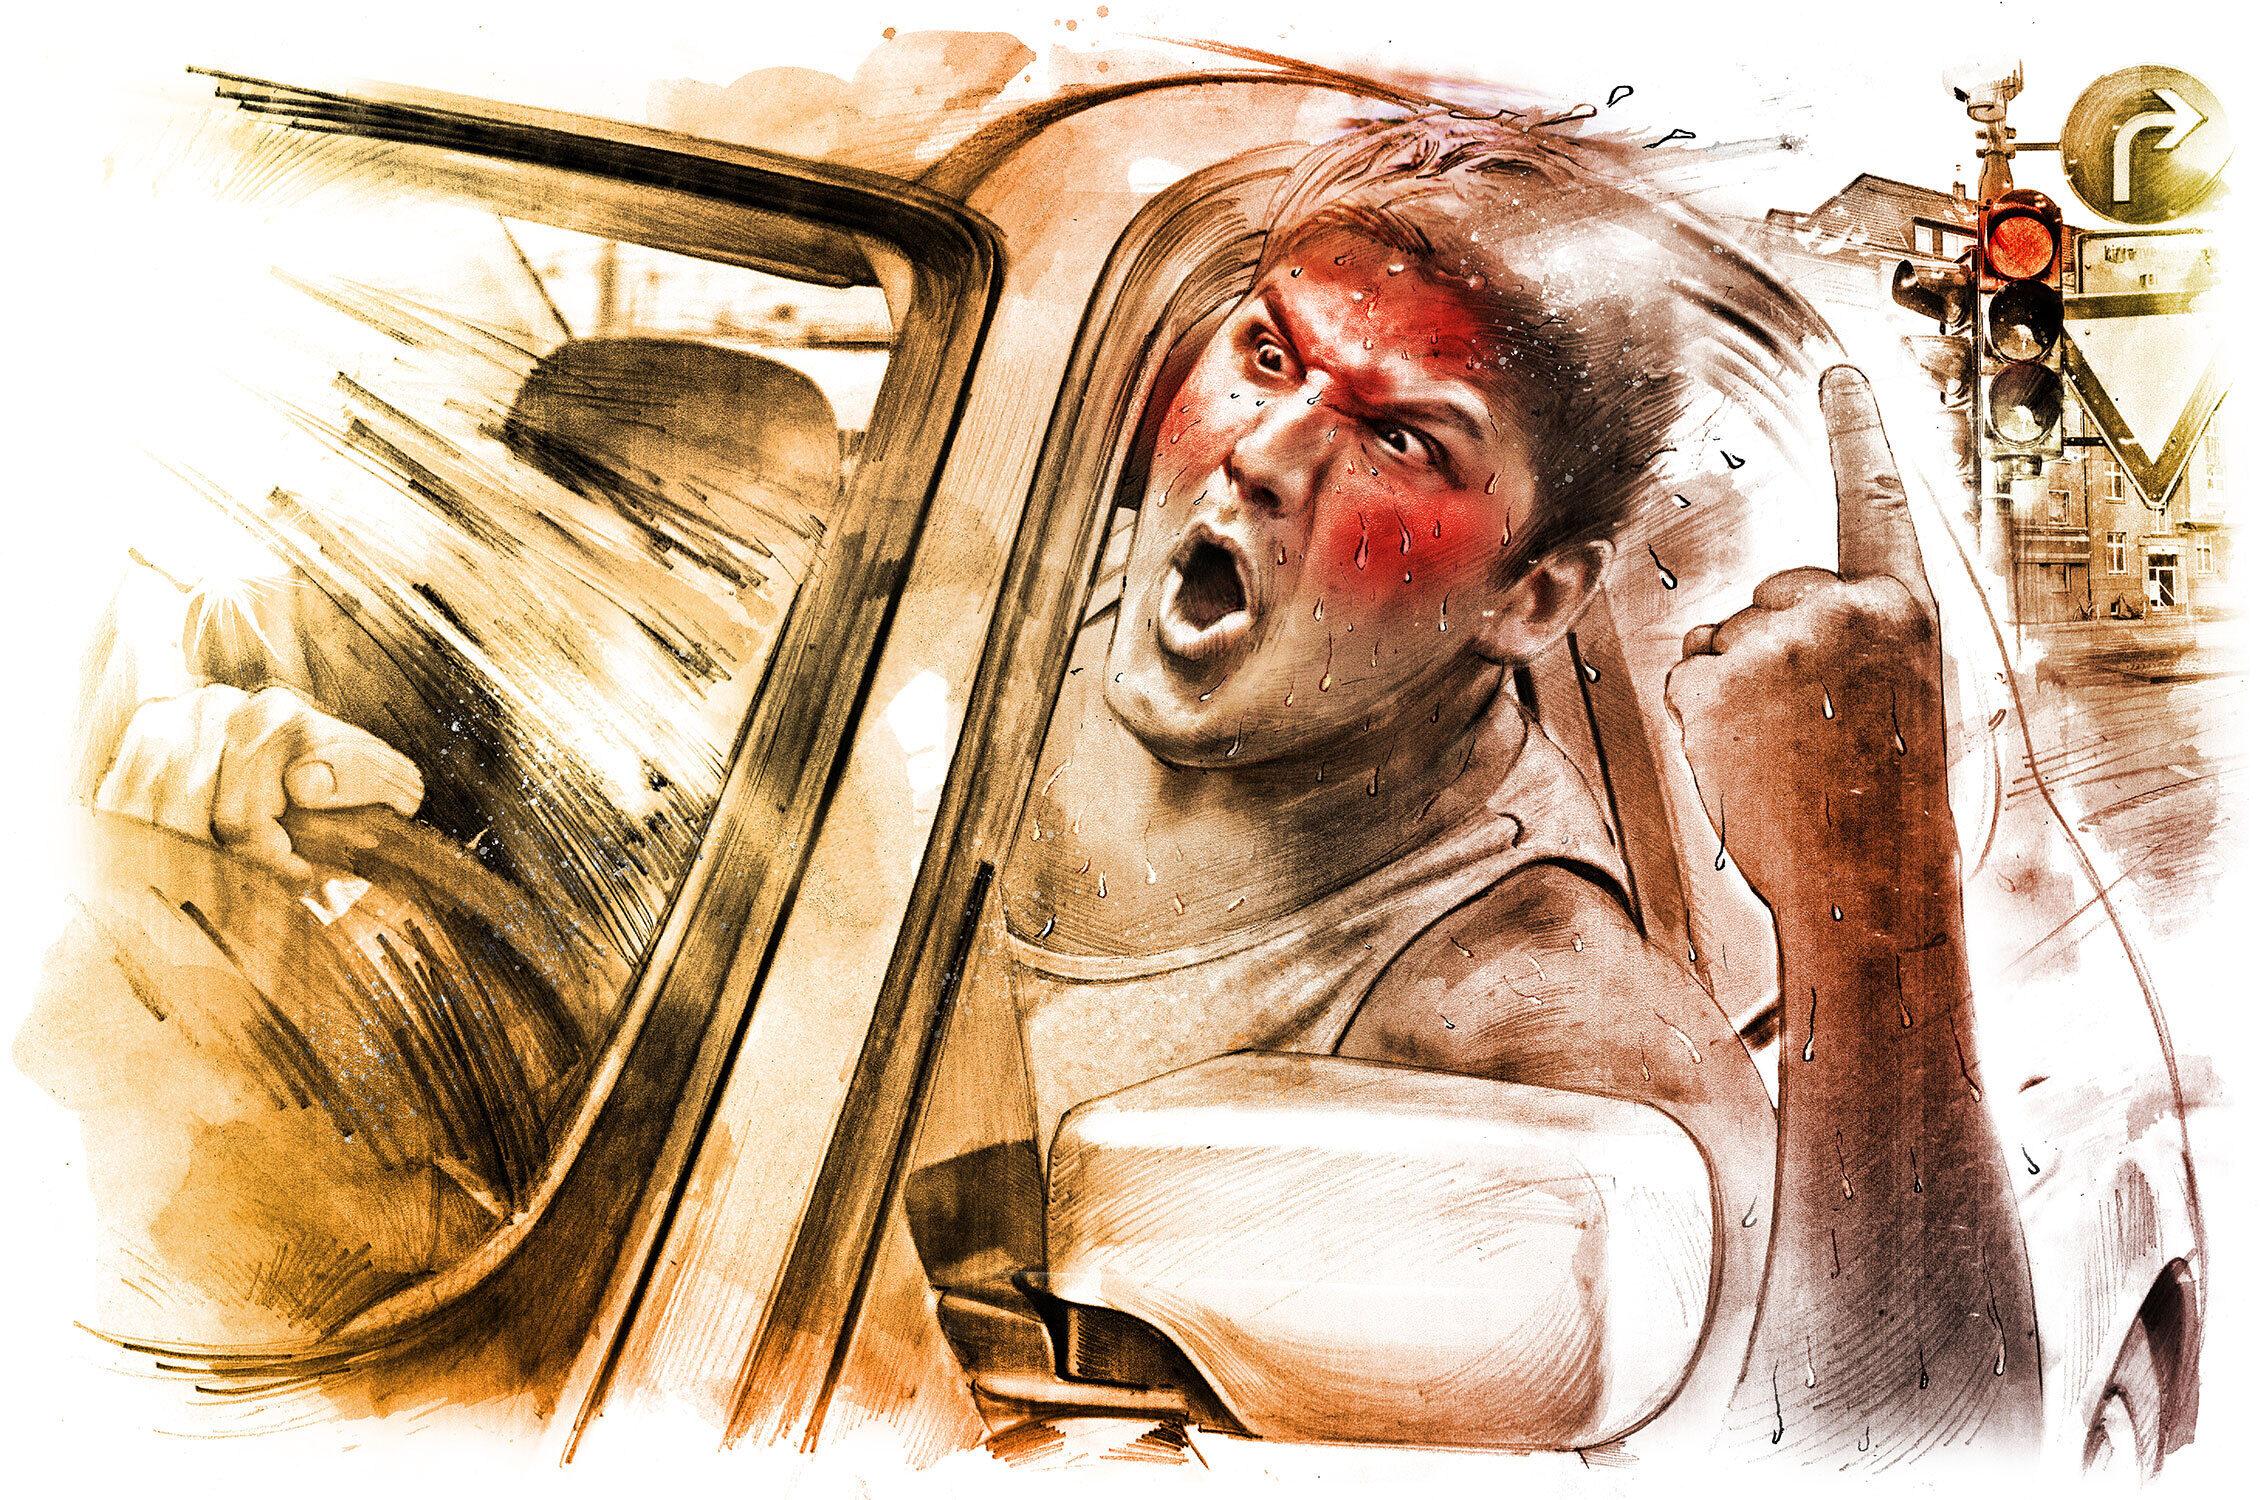 Heat agression traffic - Kornel Illustration | Kornel Stadler portfolio